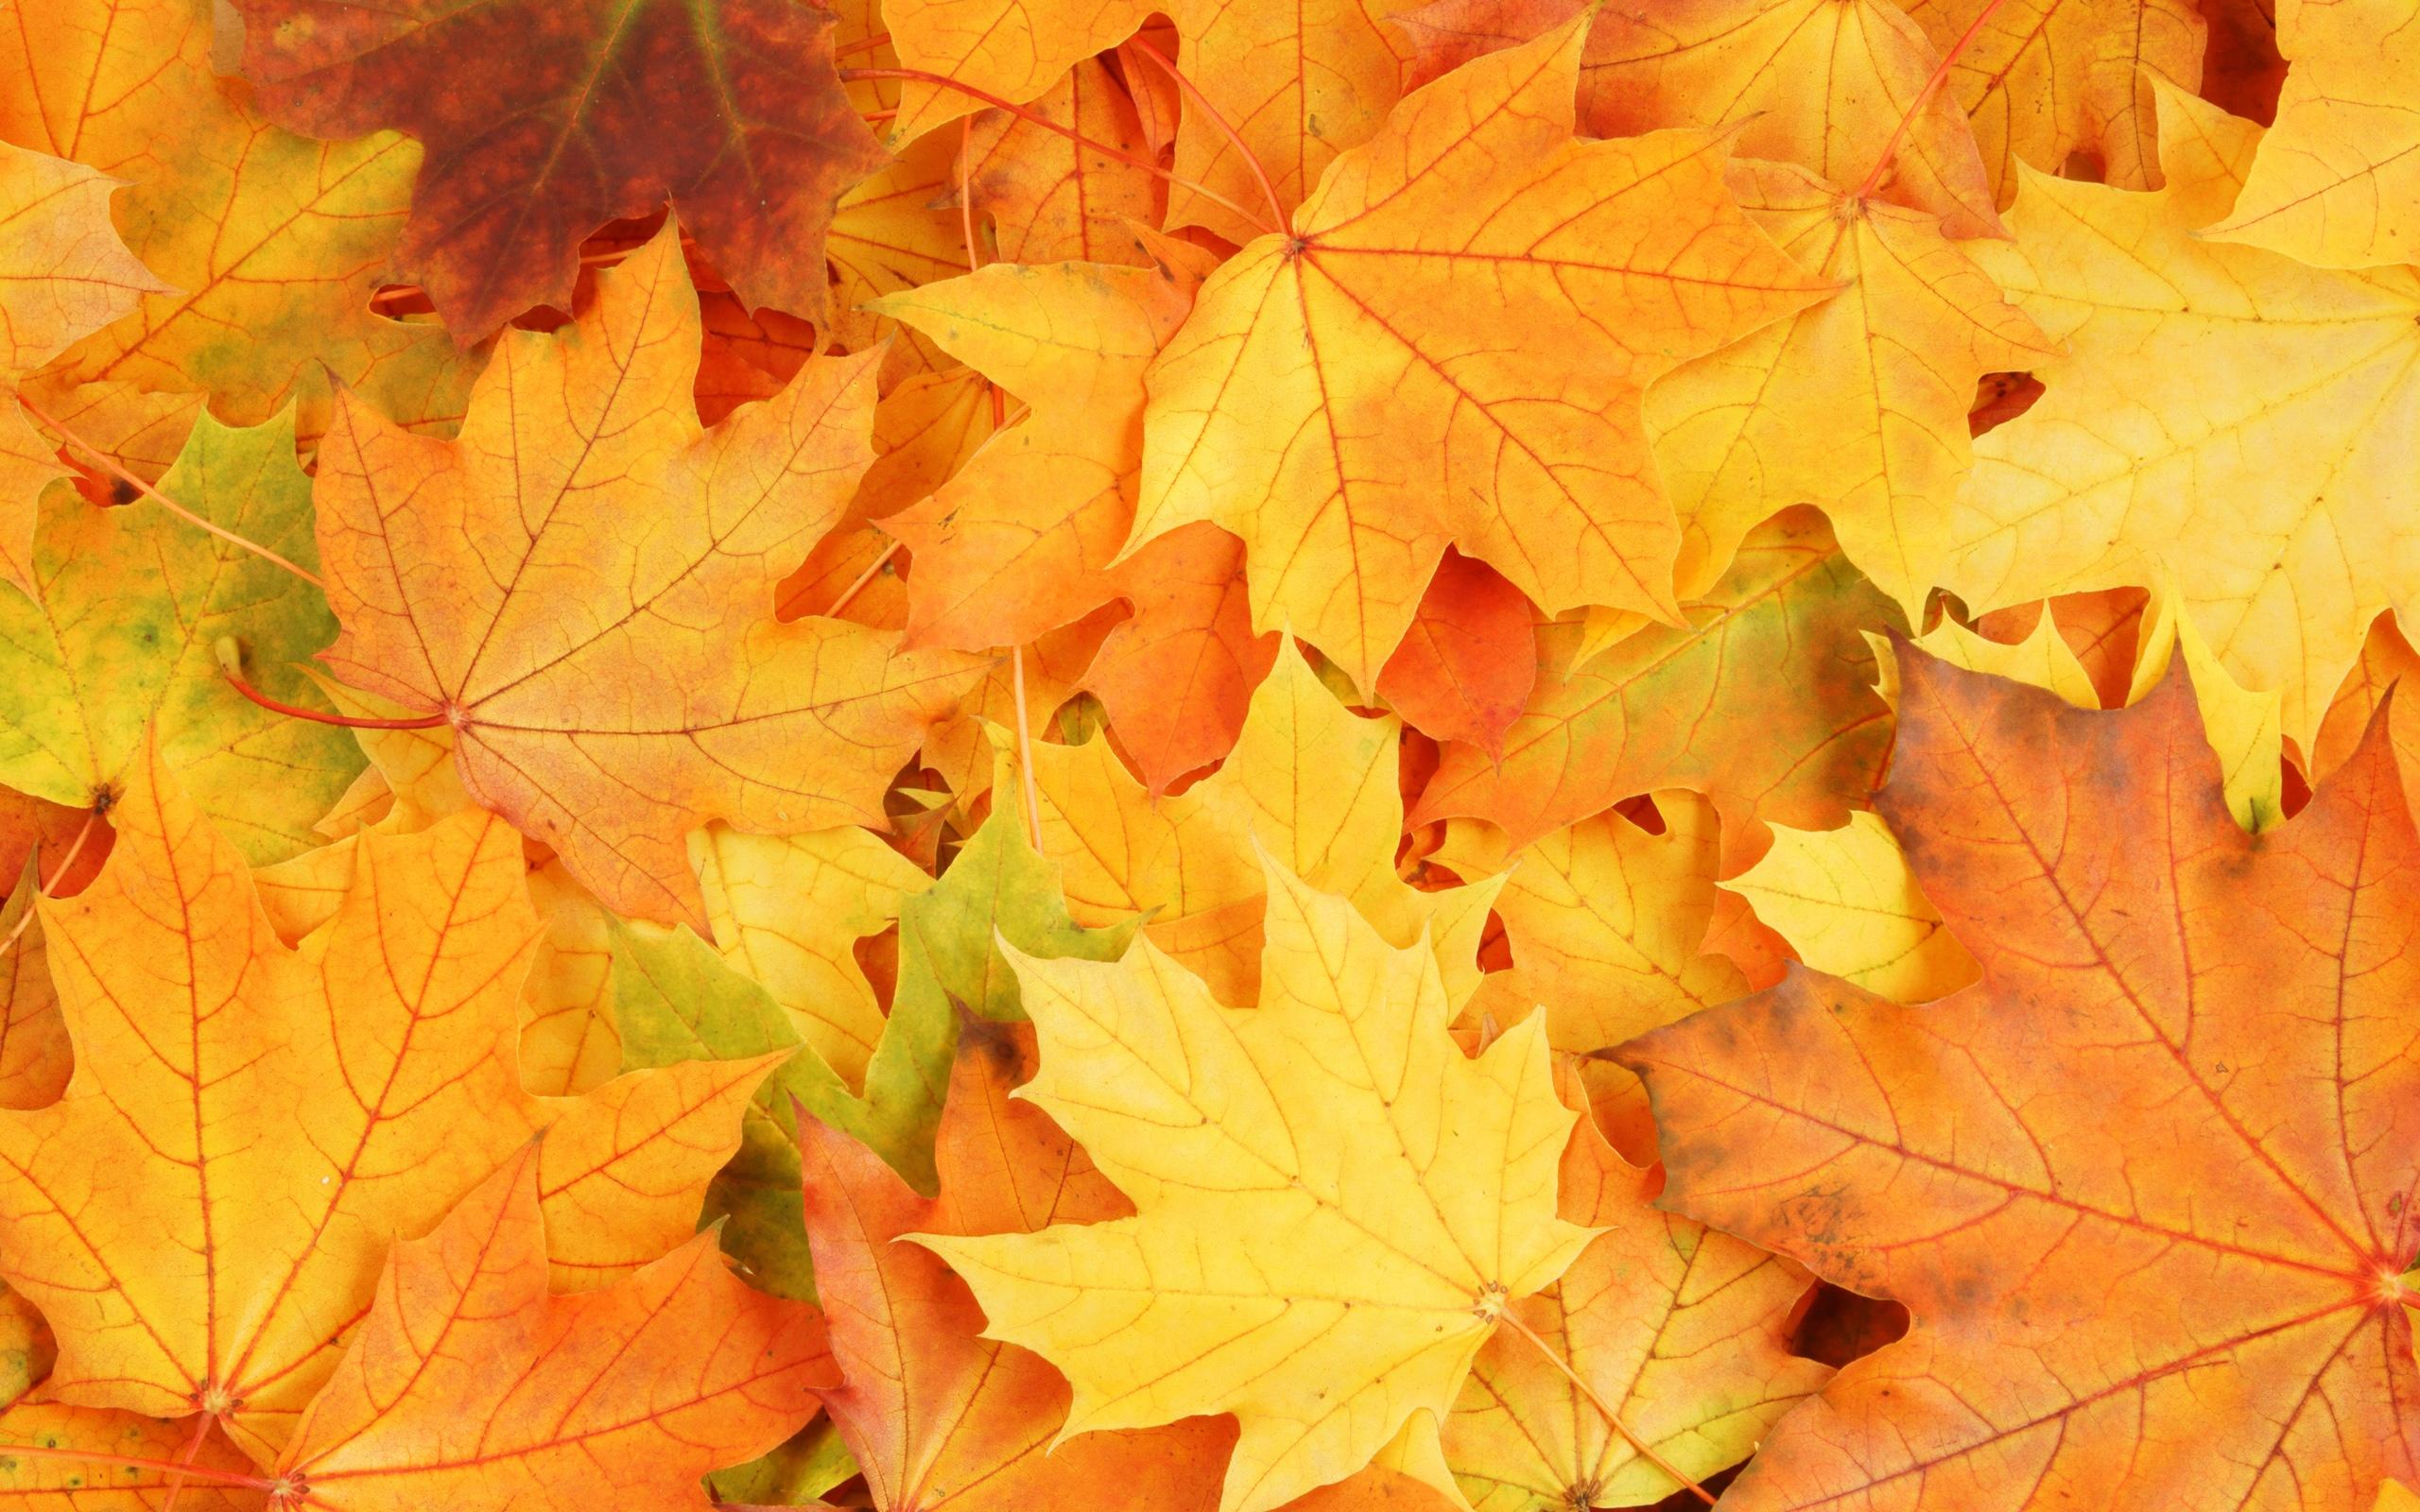 Iphone 6s Wallpaper Fall 배경 화면 가을 시즌 노란색 단풍은 바닥에 떨어지지 2560x1600 Hd 그림 이미지